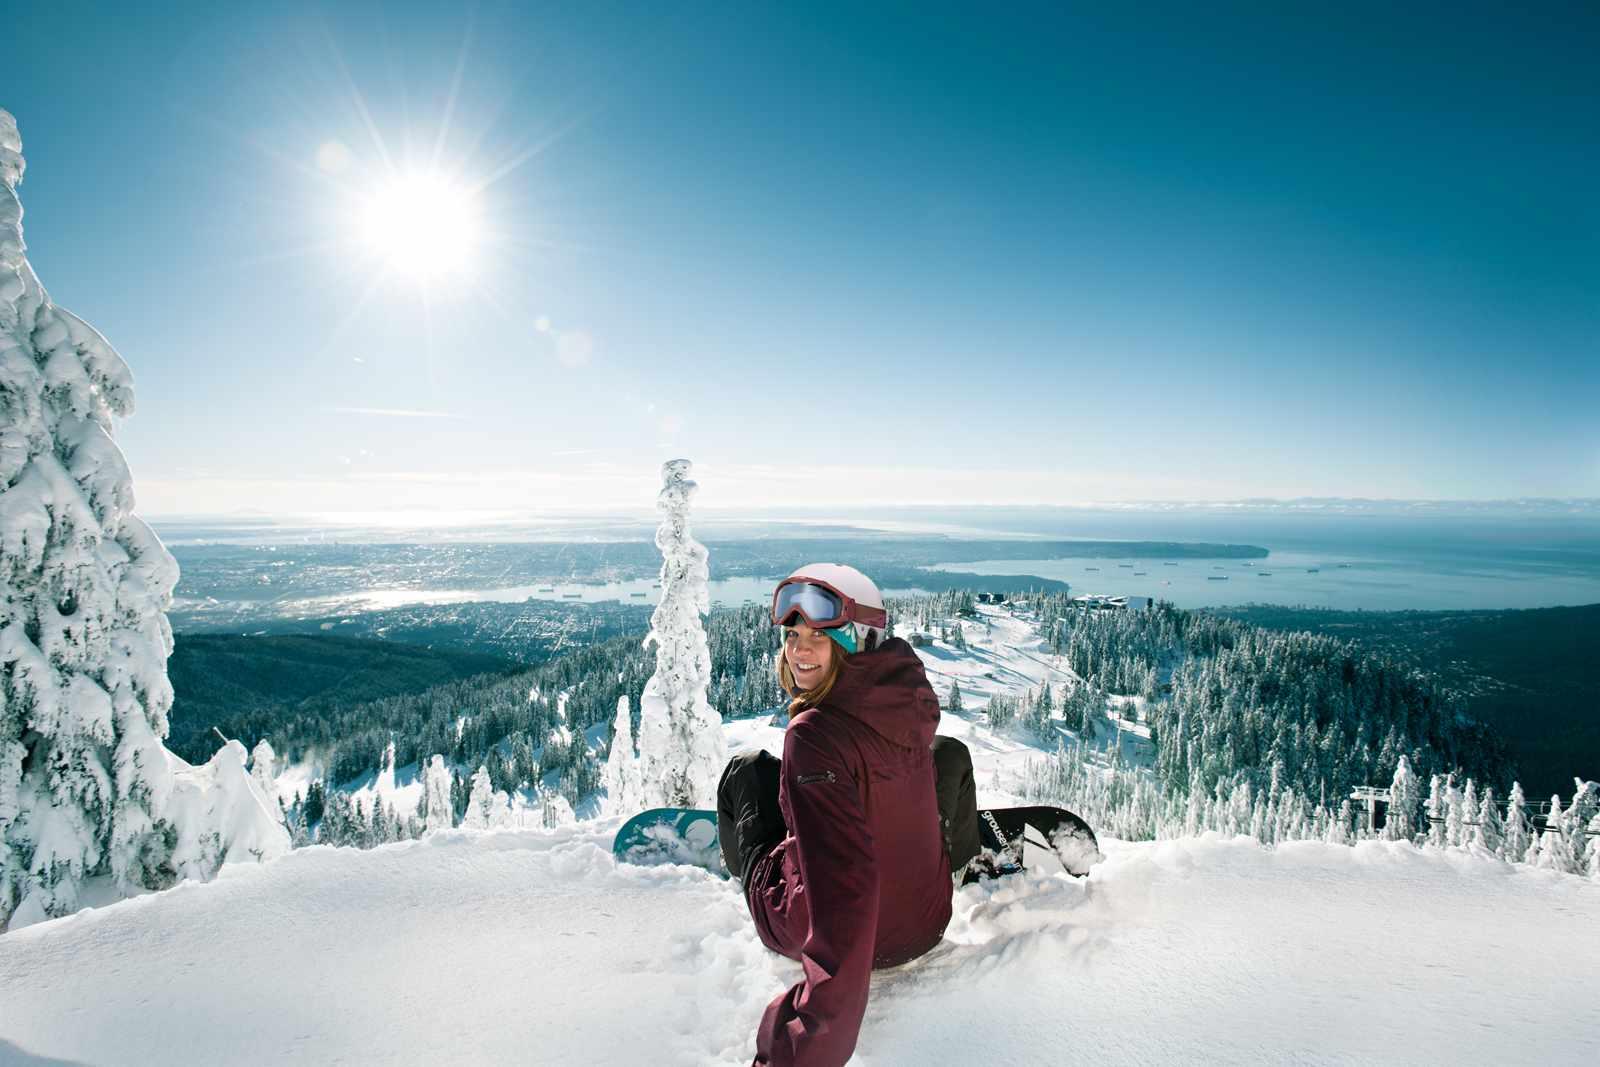 BC省滑雪指南